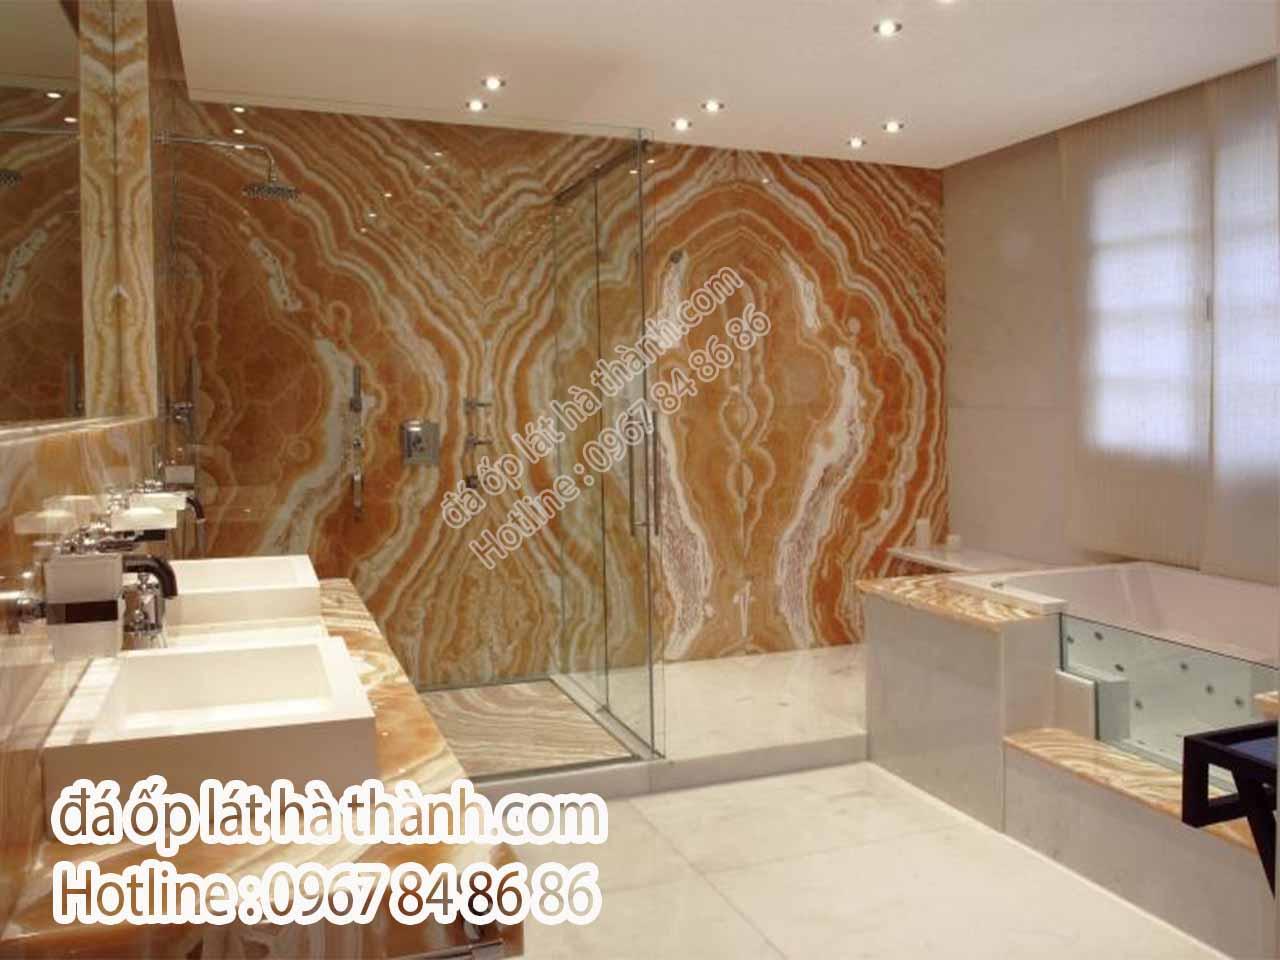 da-onyx-tu-nhien-op-tung-ve-sinh-lavabo